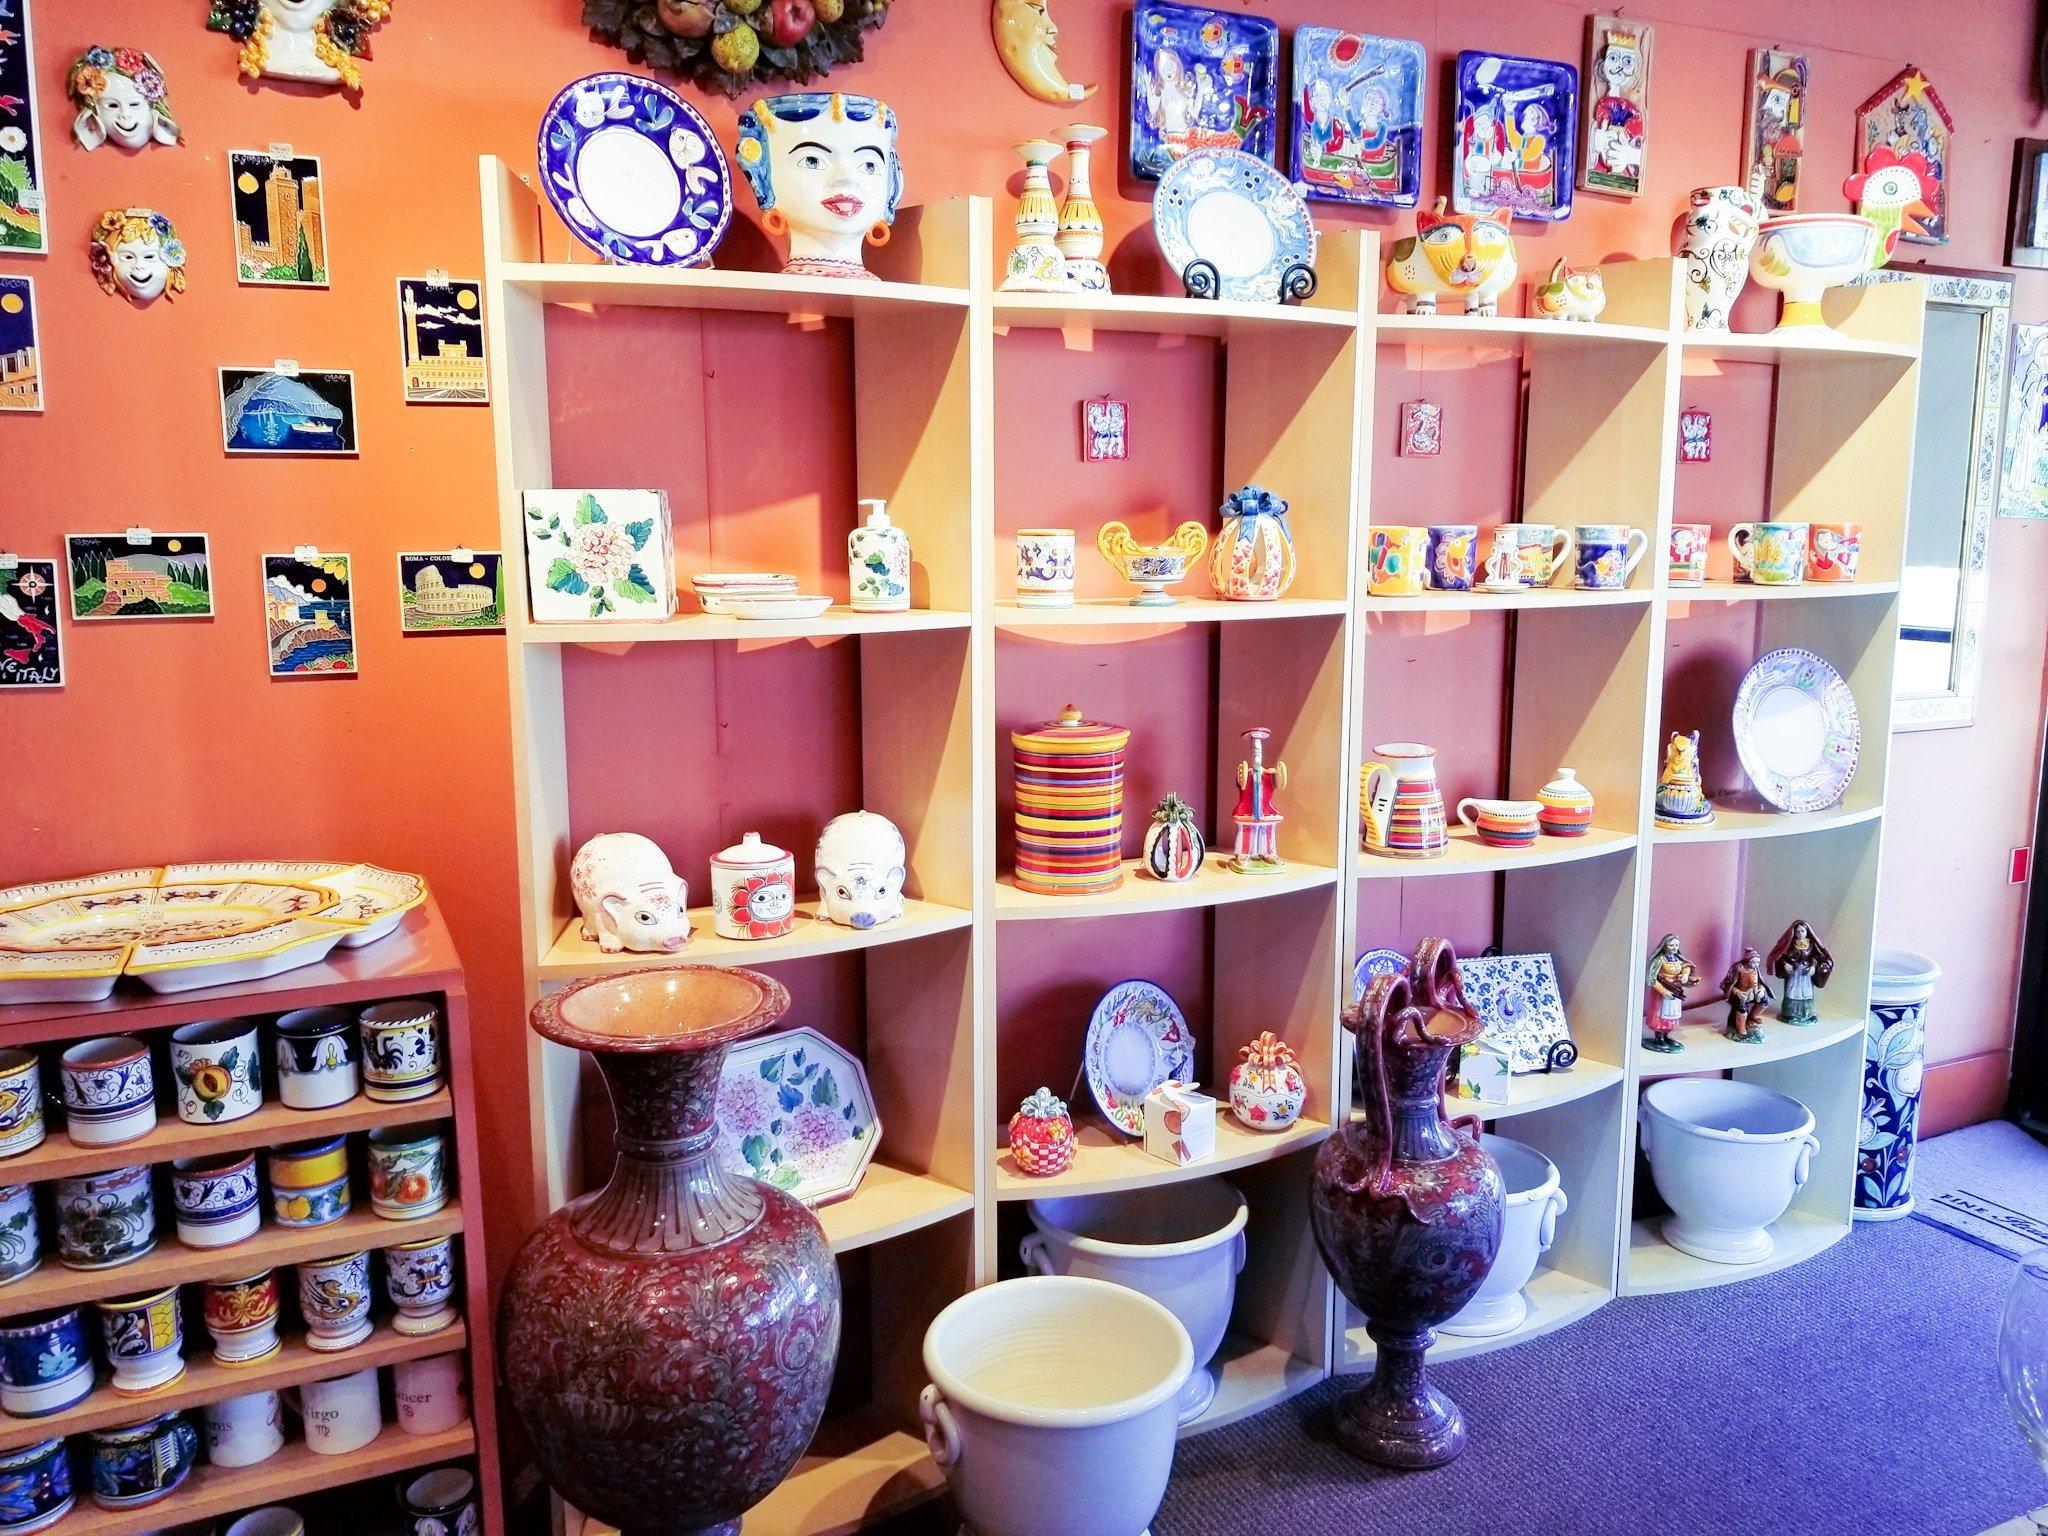 Bella Ceramica on Piedmont Ave in Oakland CA